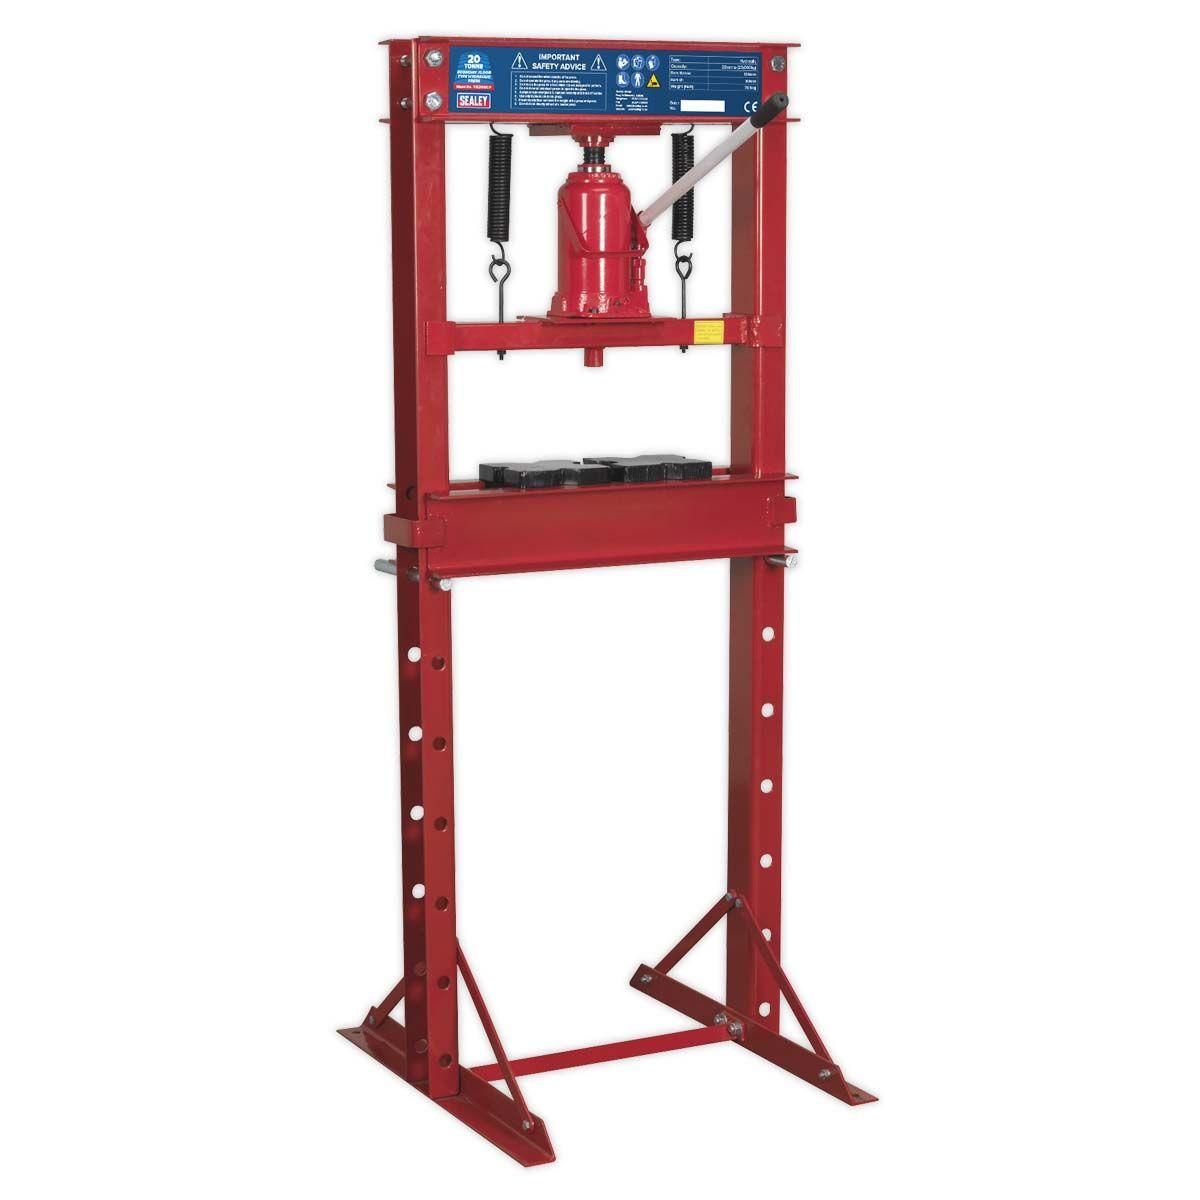 Sealey Hydraulic Press 20tonne Economy Floor Type